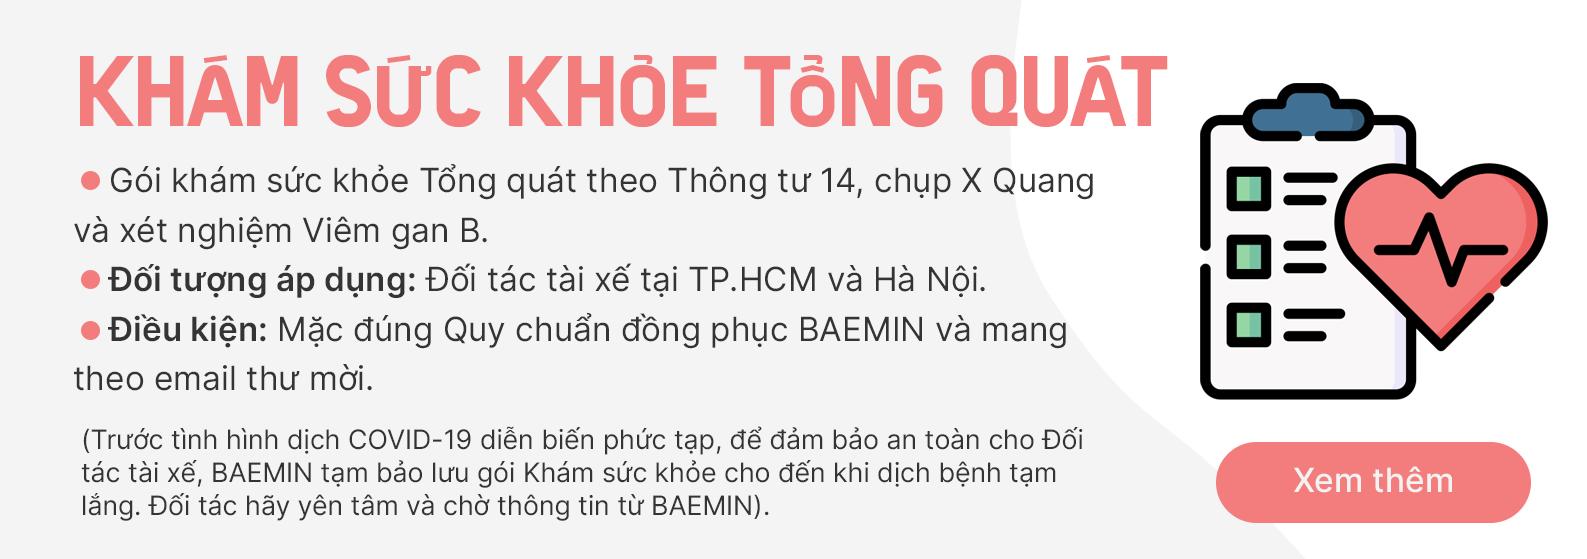 Benefit - Kham suc khoe